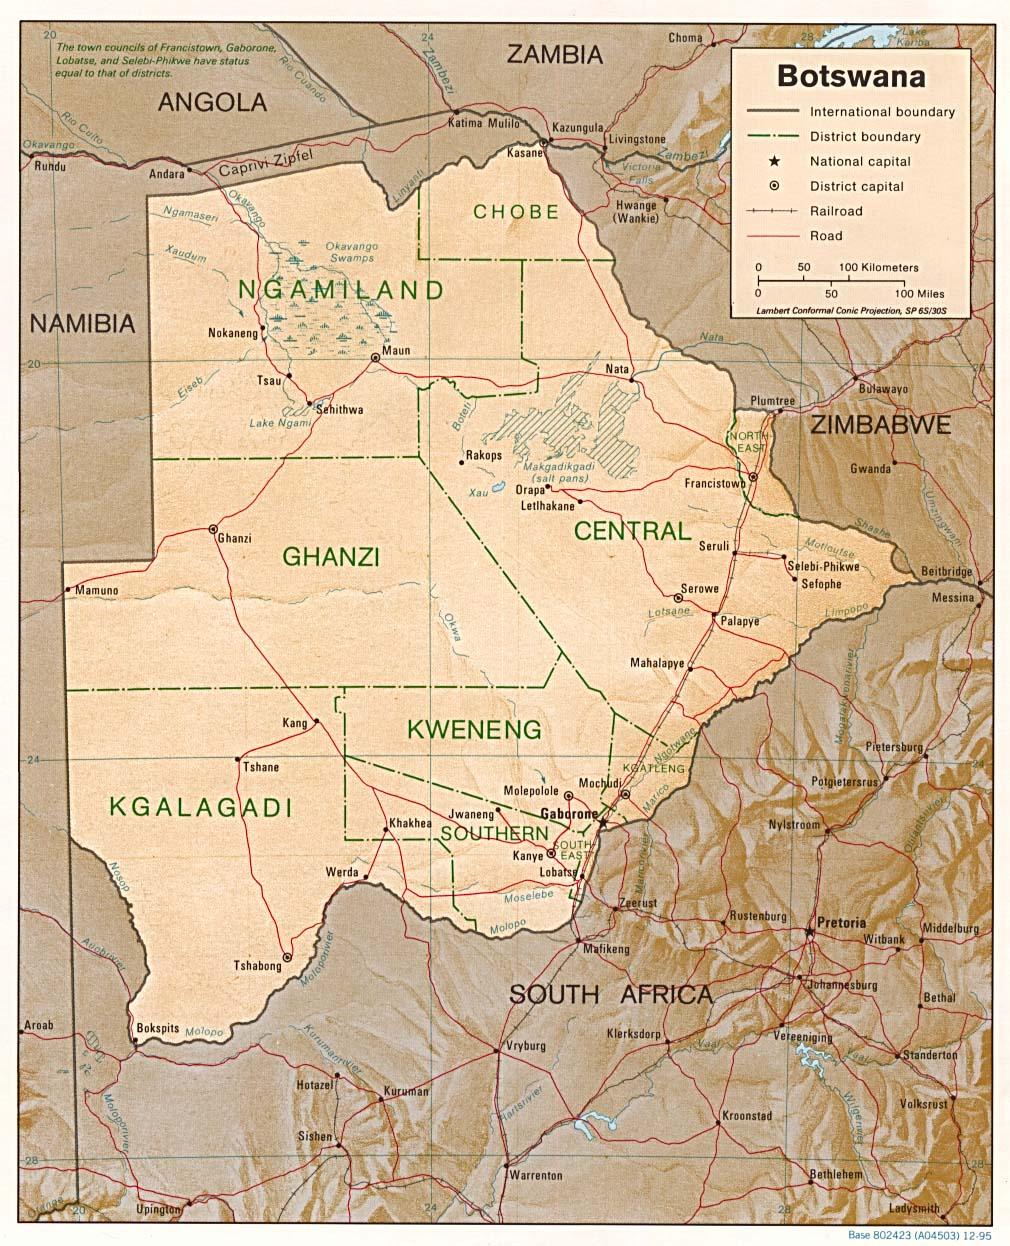 Botswana - relief